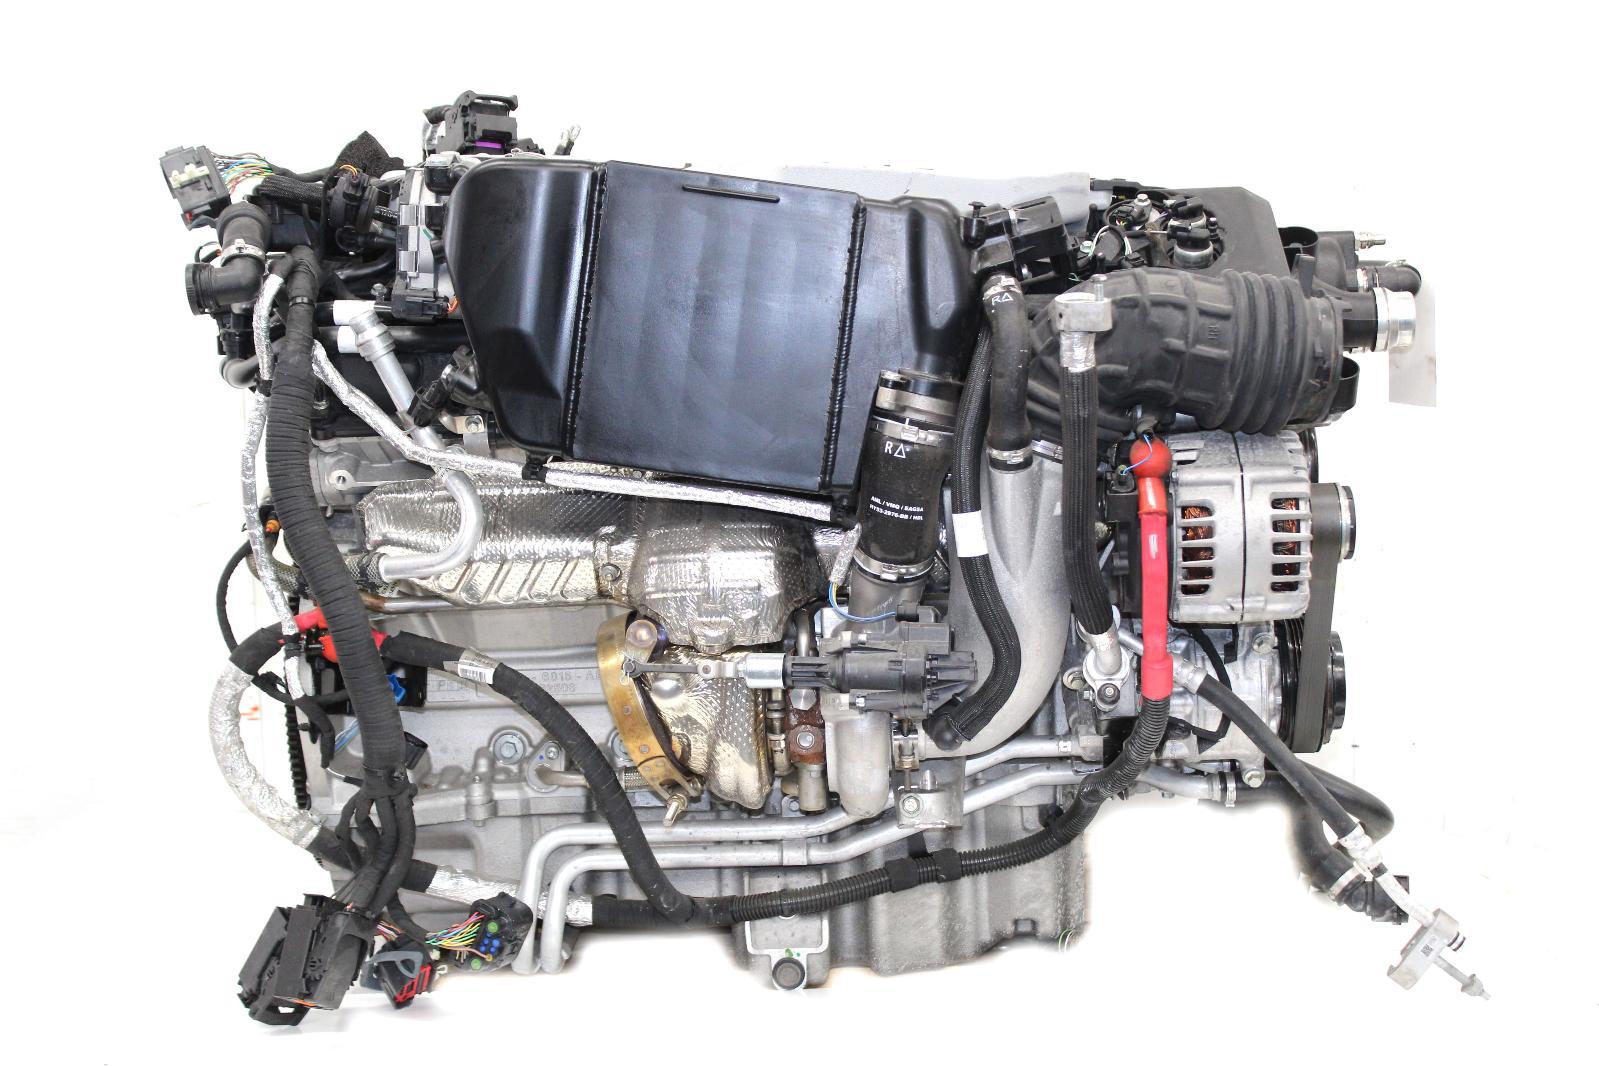 2017 Aston Martin Db11 Ae31 5204cc Petrol V12 Automatic Engine With Turbos Ebay